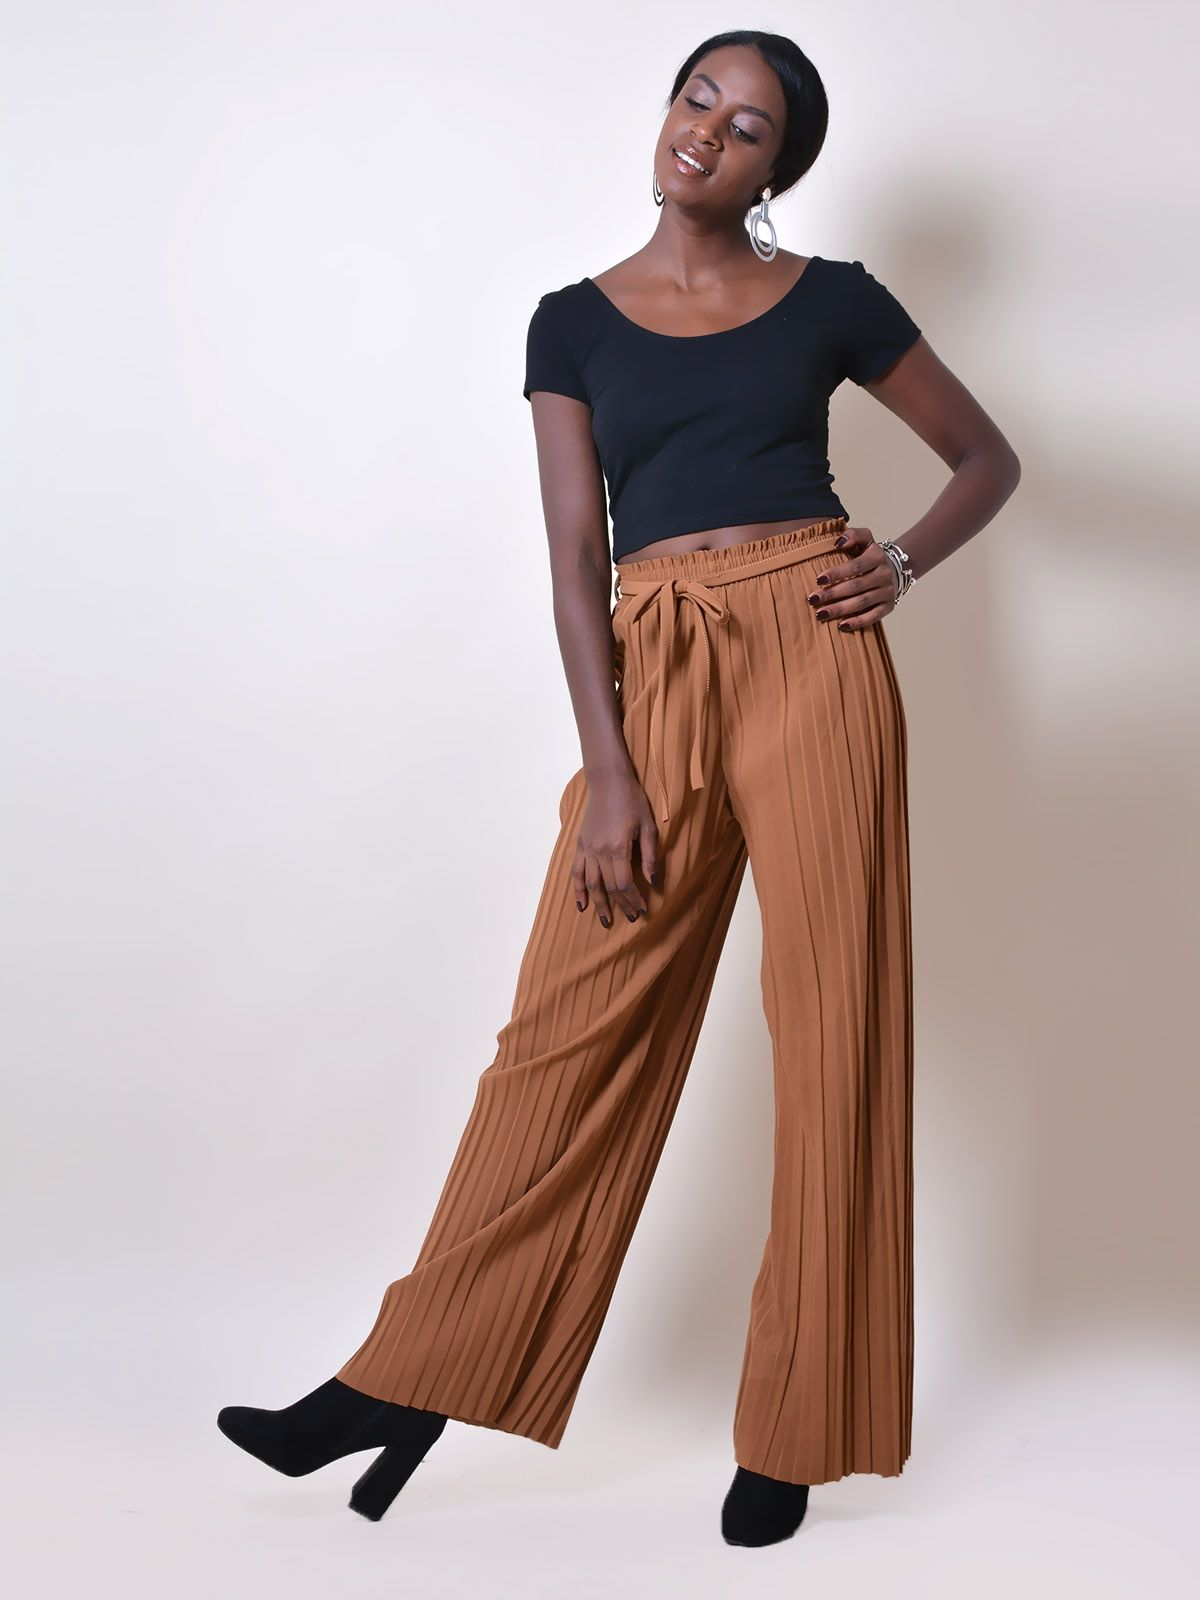 PA7367 Παντελόνα Πλισέ Ελαστική με Ζωνάκι - Decoro - Γυναικεία ρούχα ... 9311cf1b392